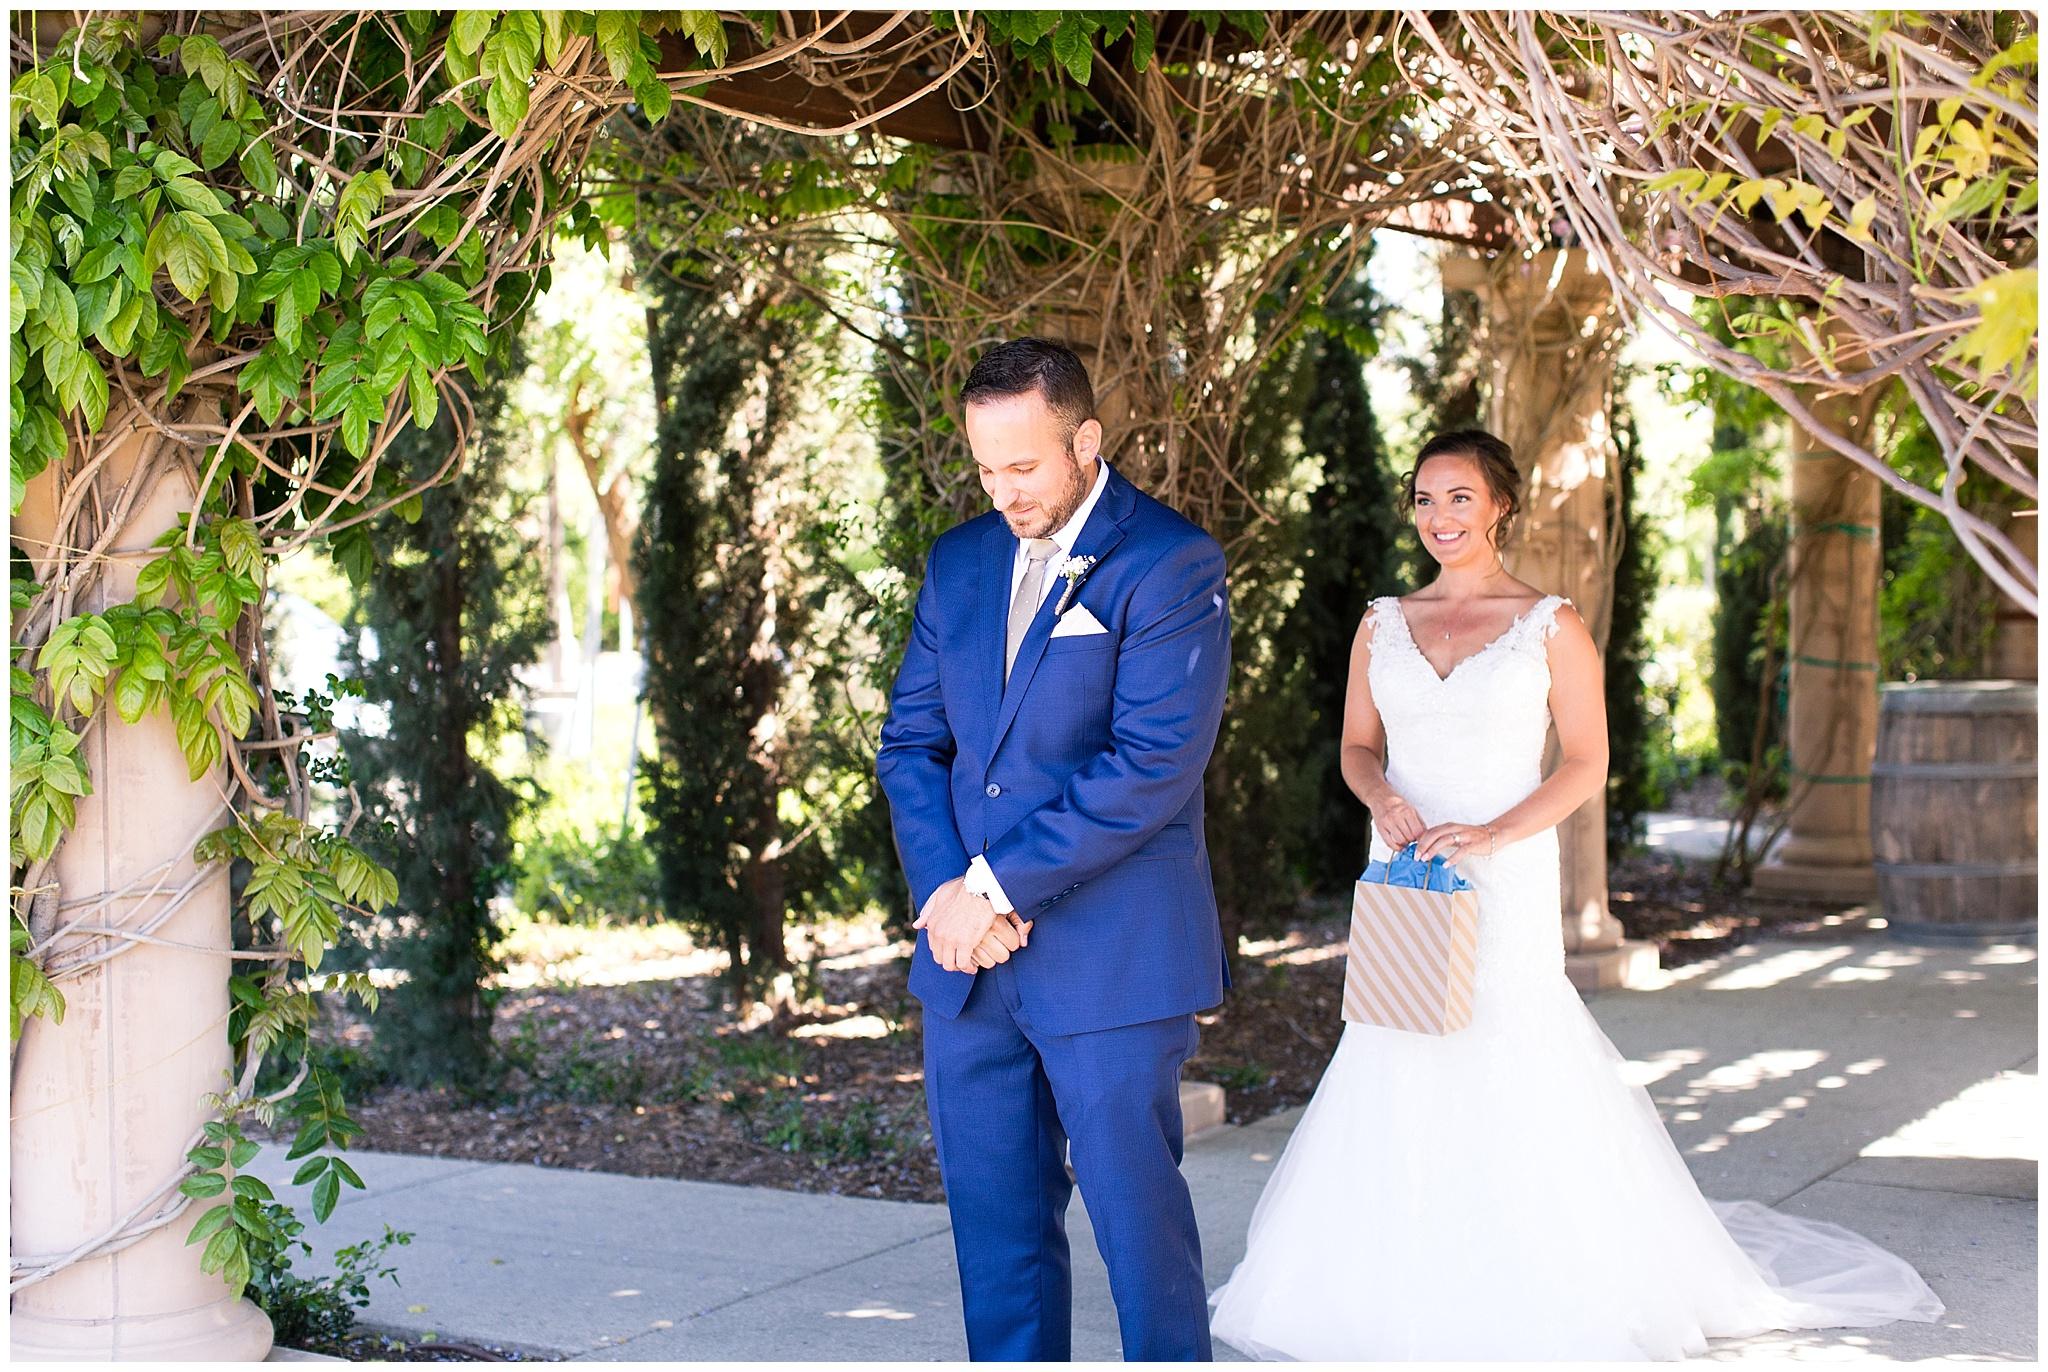 Vinny-Cayt-Wedding-04-26-18-0613.jpg